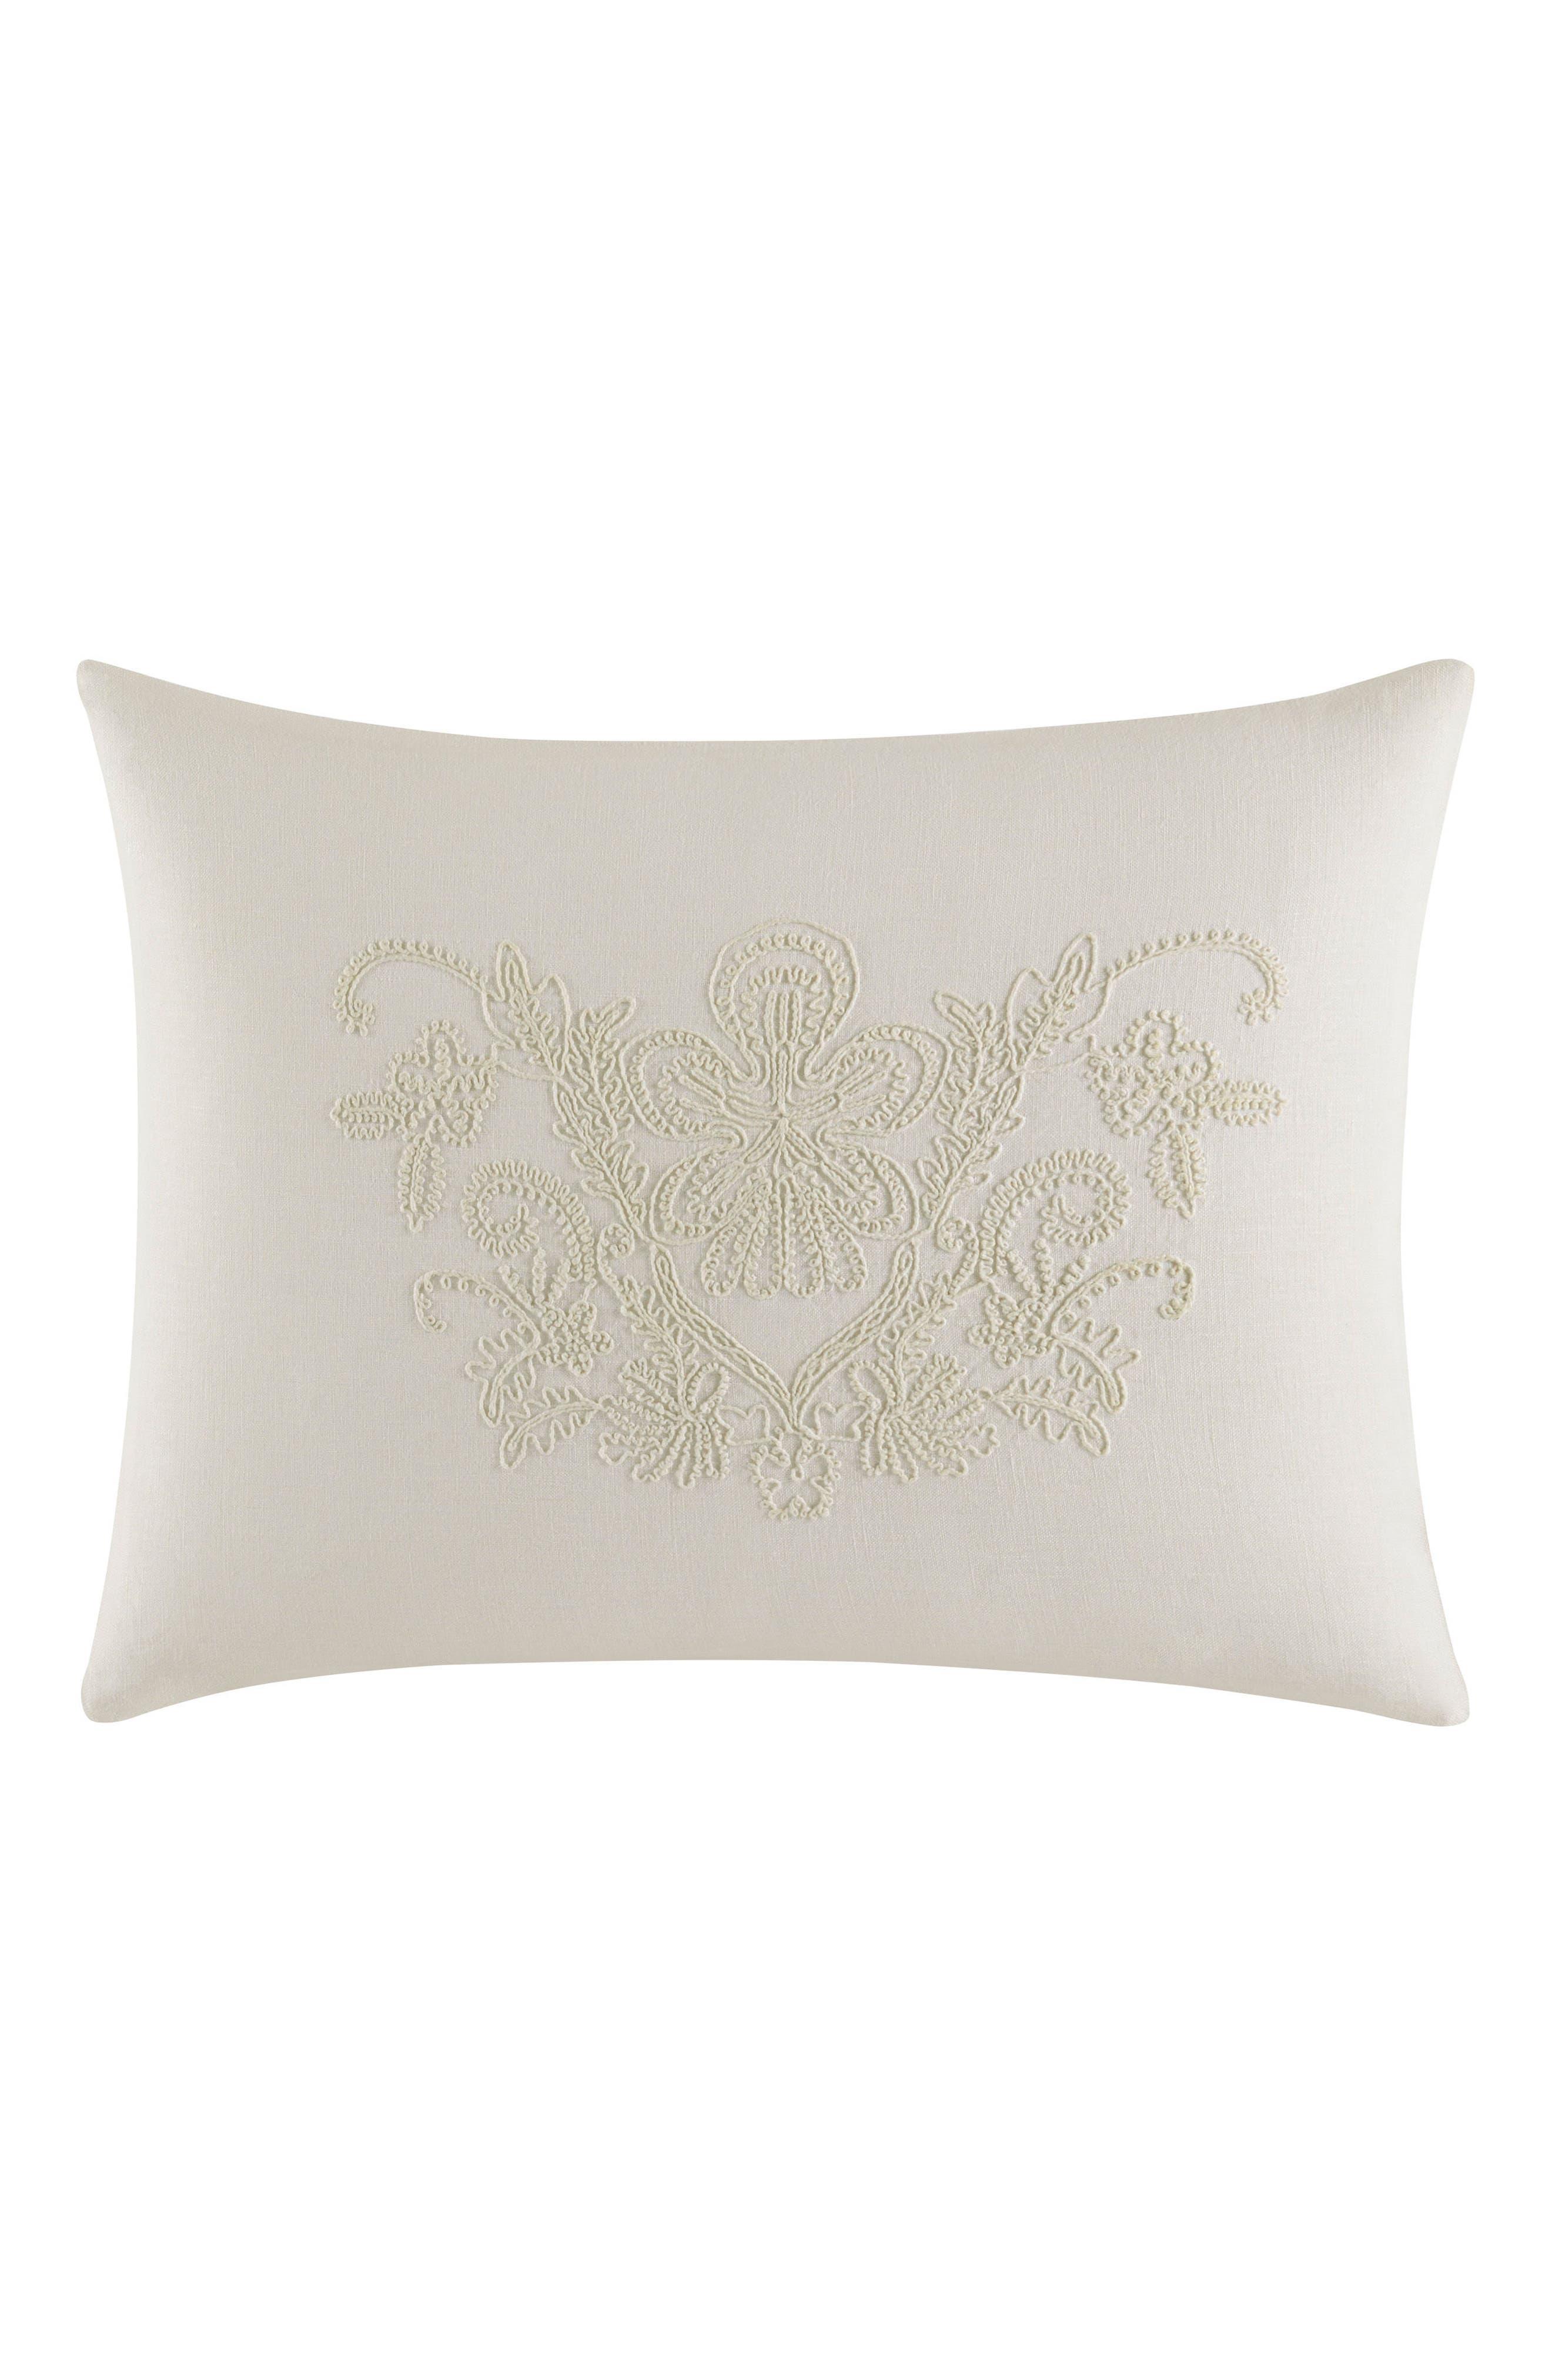 Passementerie Breakfast Linen Accent Pillow,                         Main,                         color, Natural